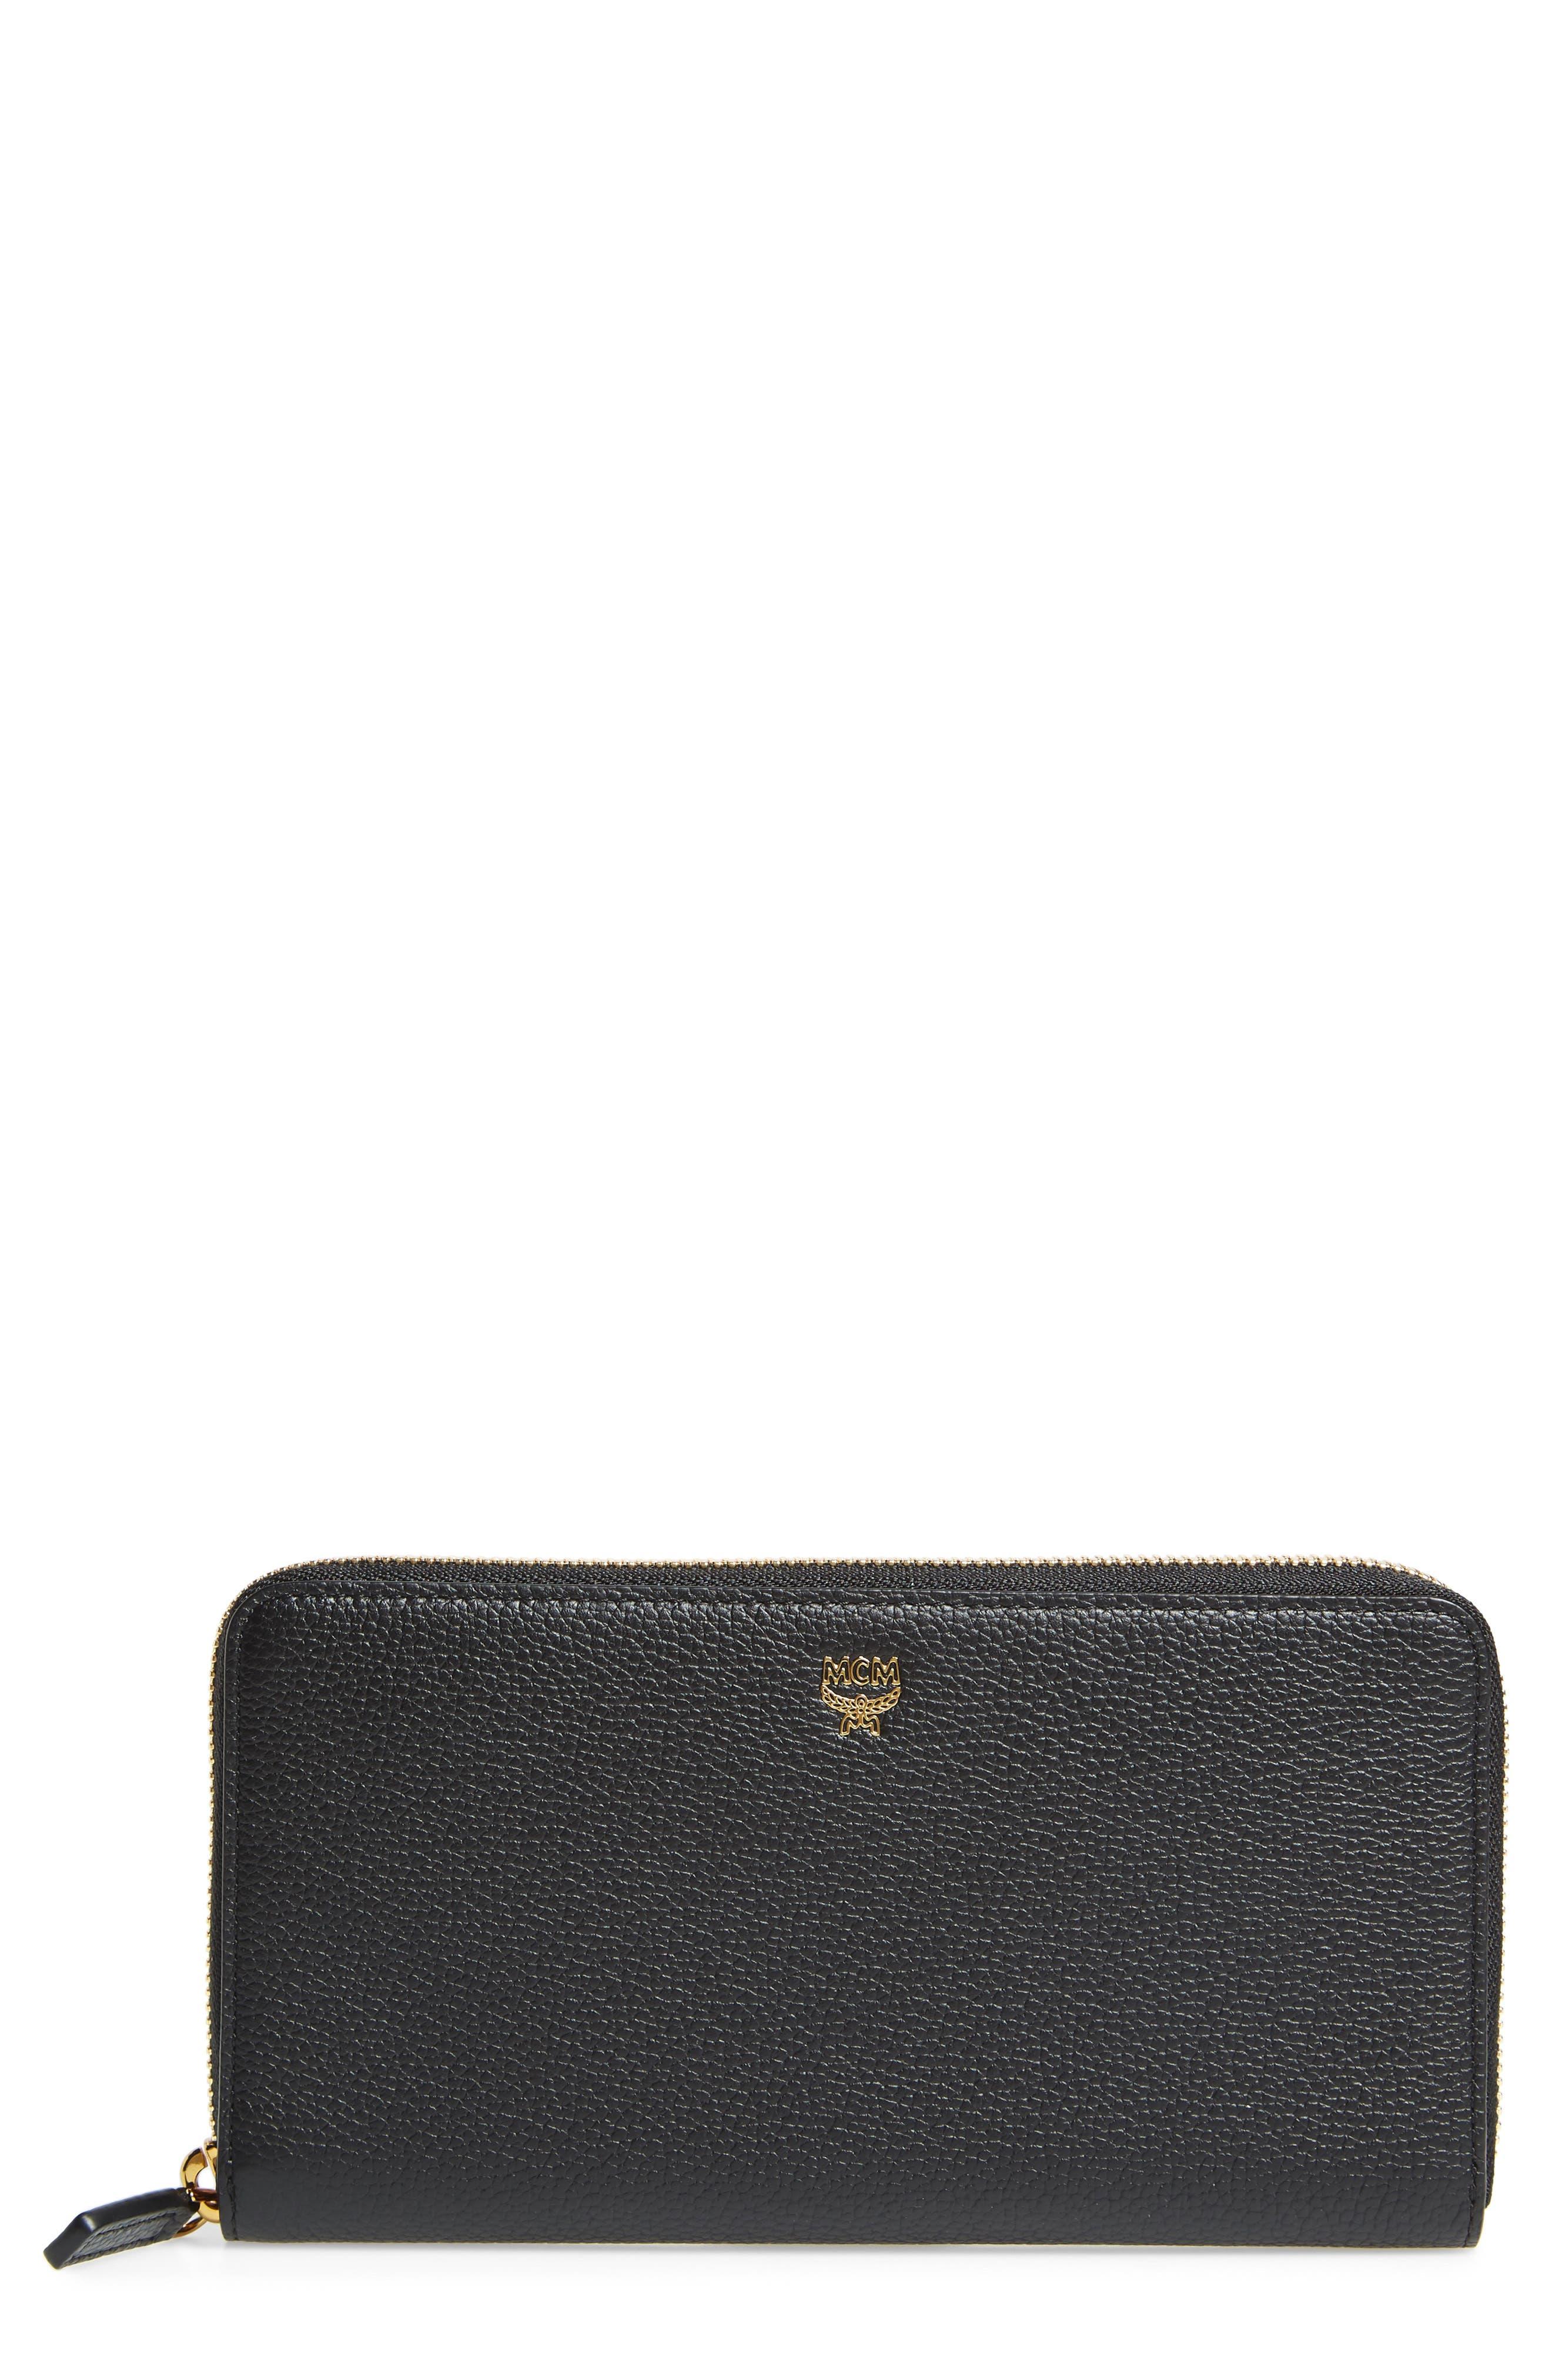 MCM Large Milla Zip-Around Leather Wallet